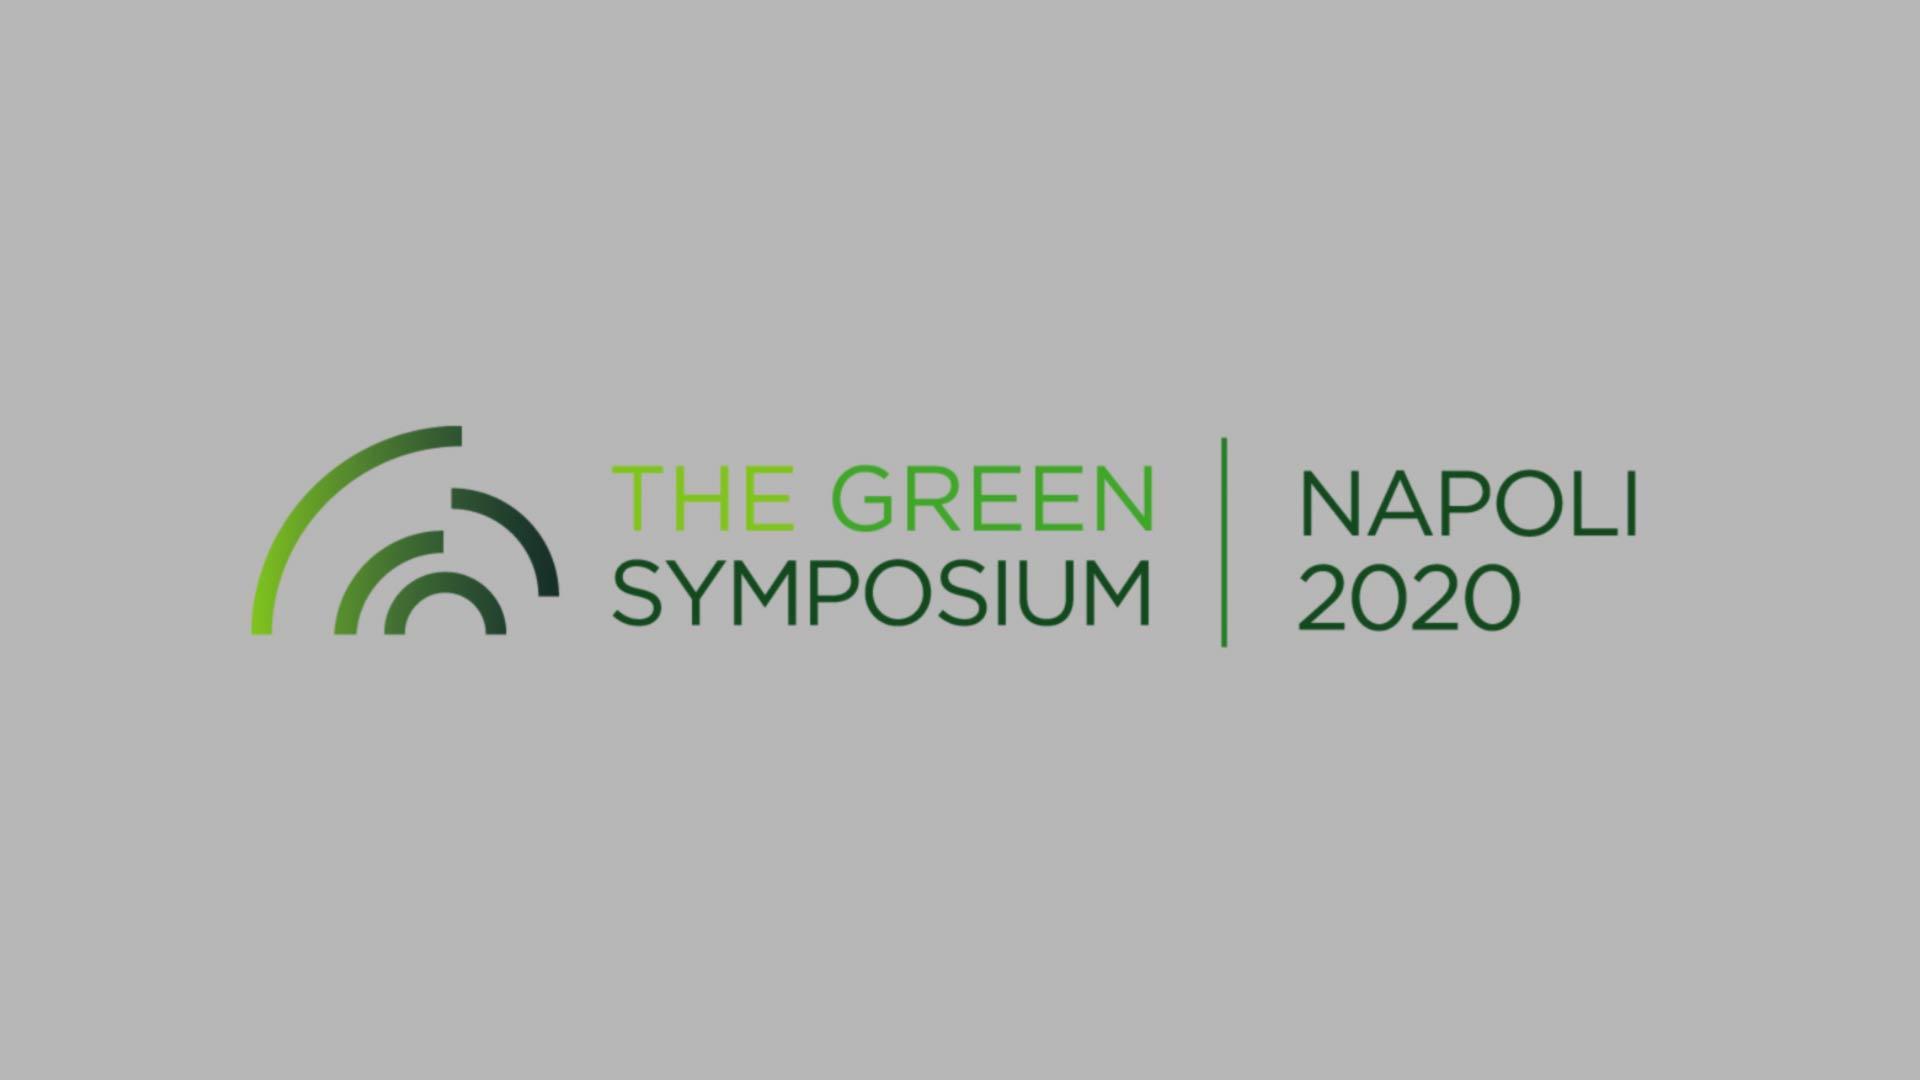 COPERTINA GREEN SYMPOSIUM